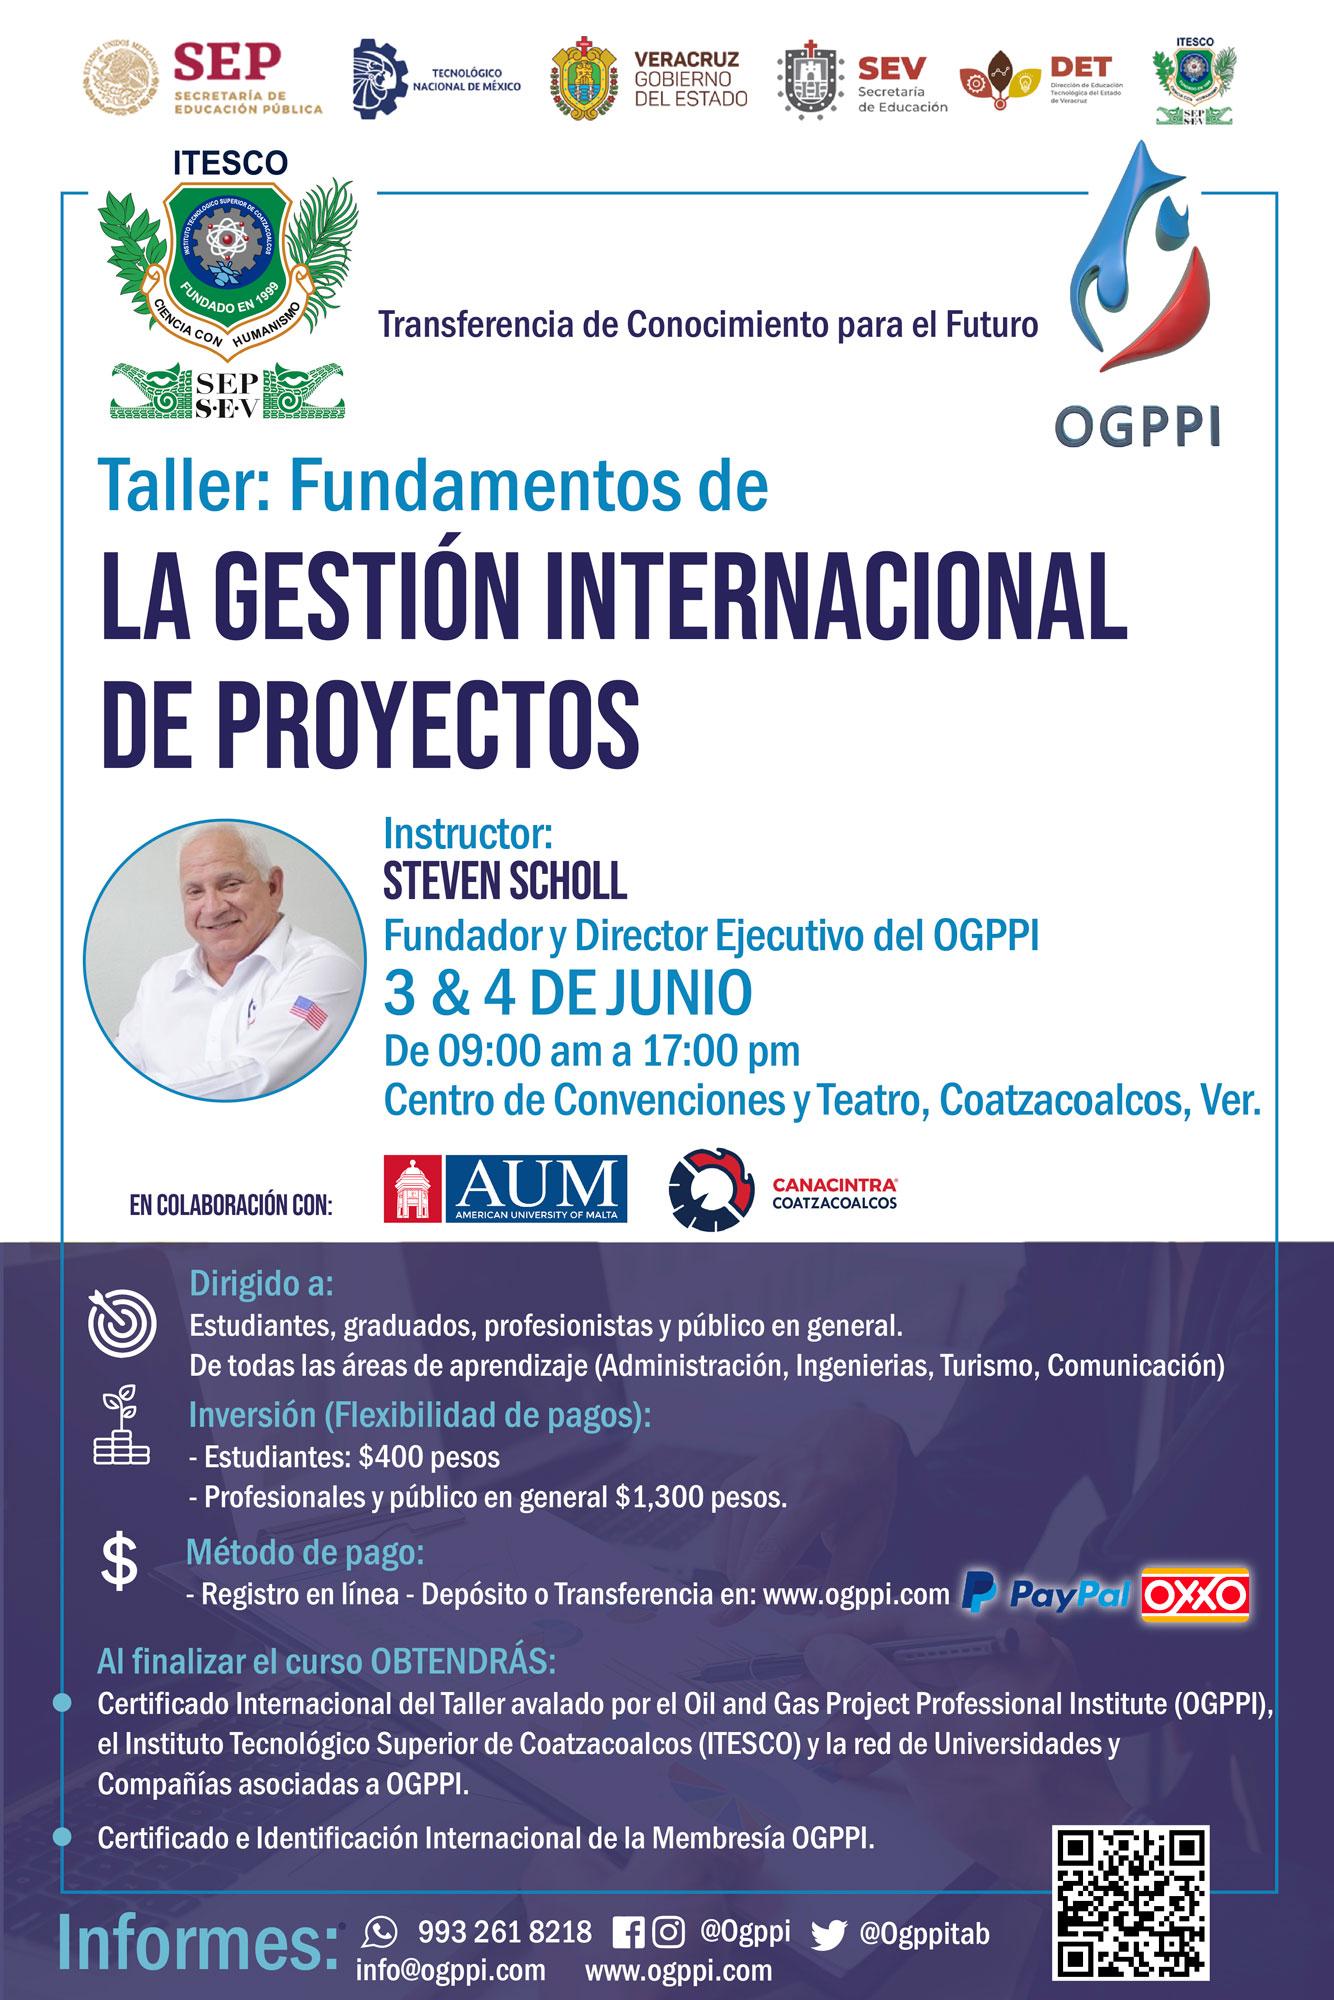 OGPPI-ITESCO_new_may